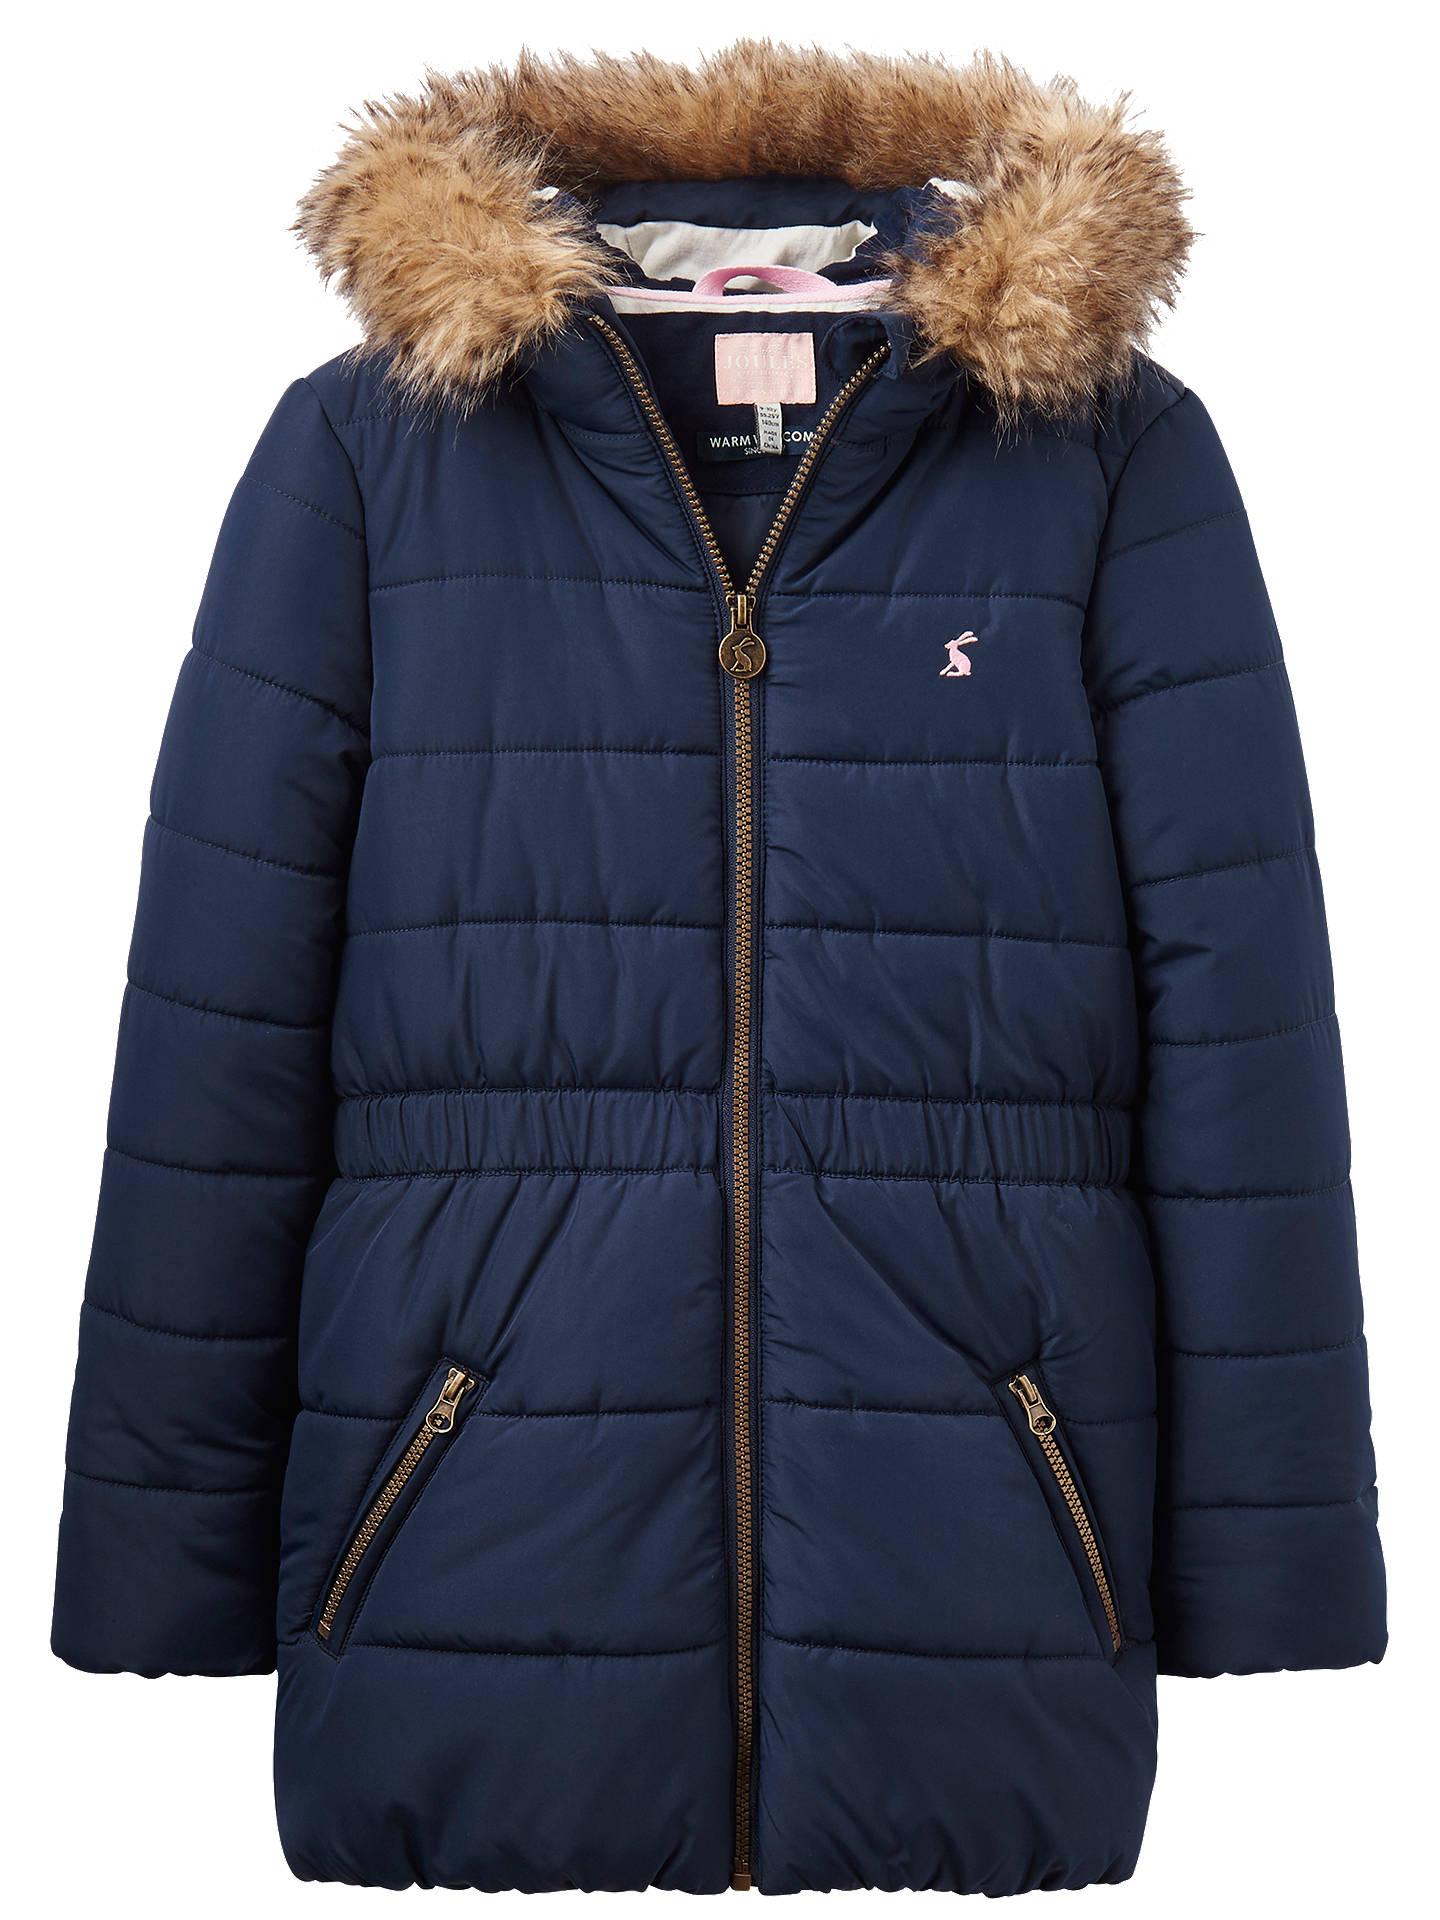 009eadc19 Buy Little Joule Girls' Belmont Coat, Navy, 3 years Online at johnlewis.